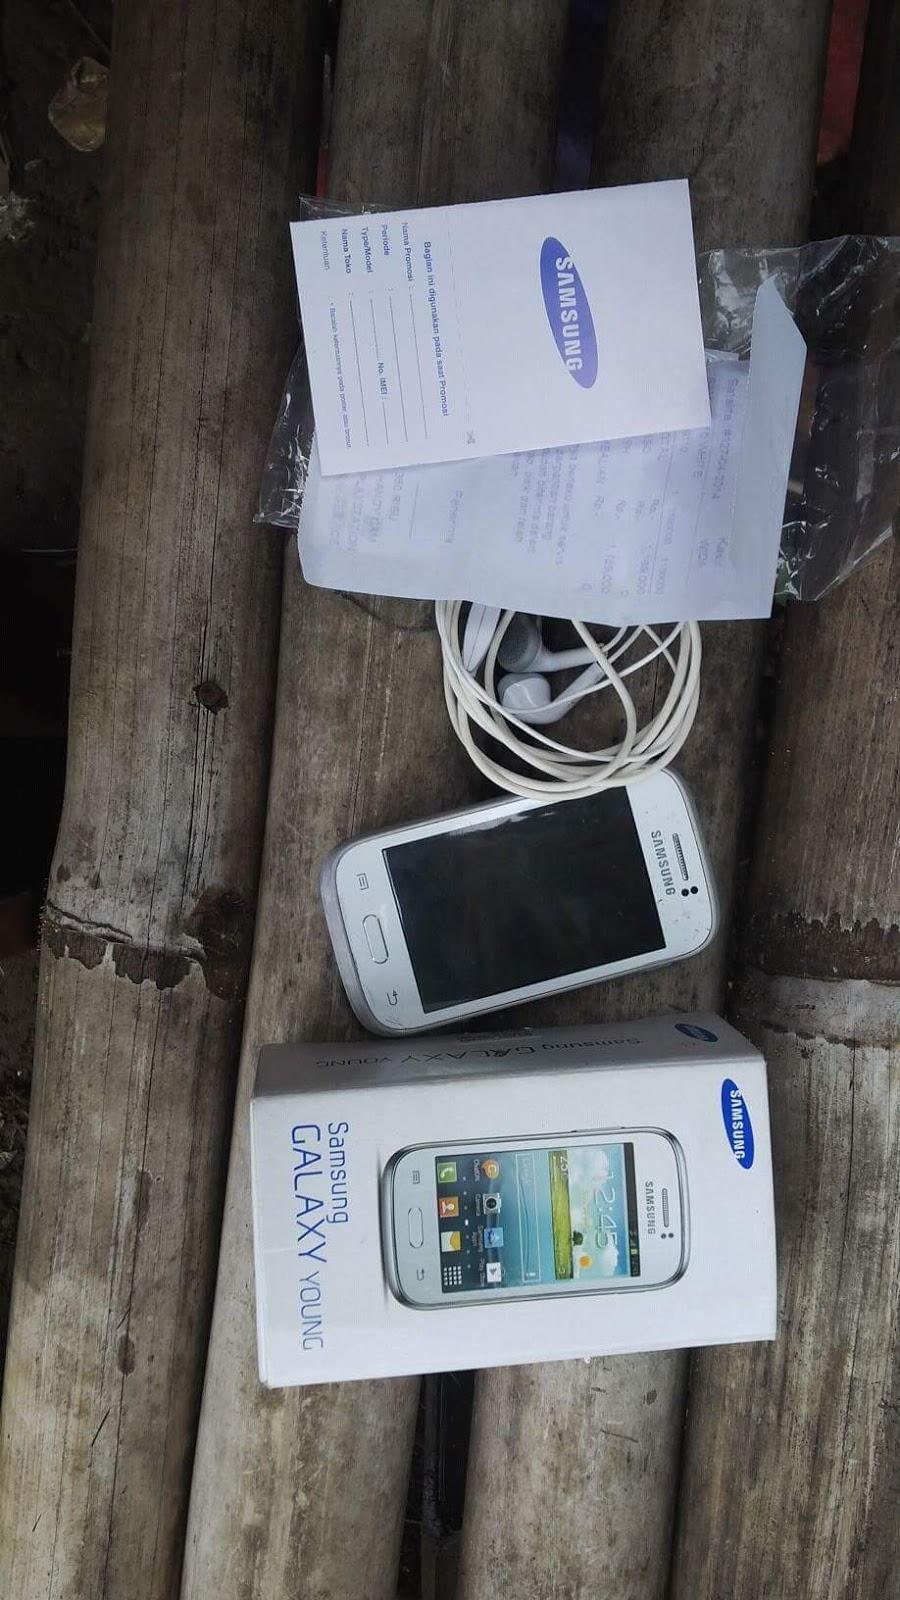 Harga Bekas Samsung Galaxy Young 2 Single Full Set Dan Spesifikasi